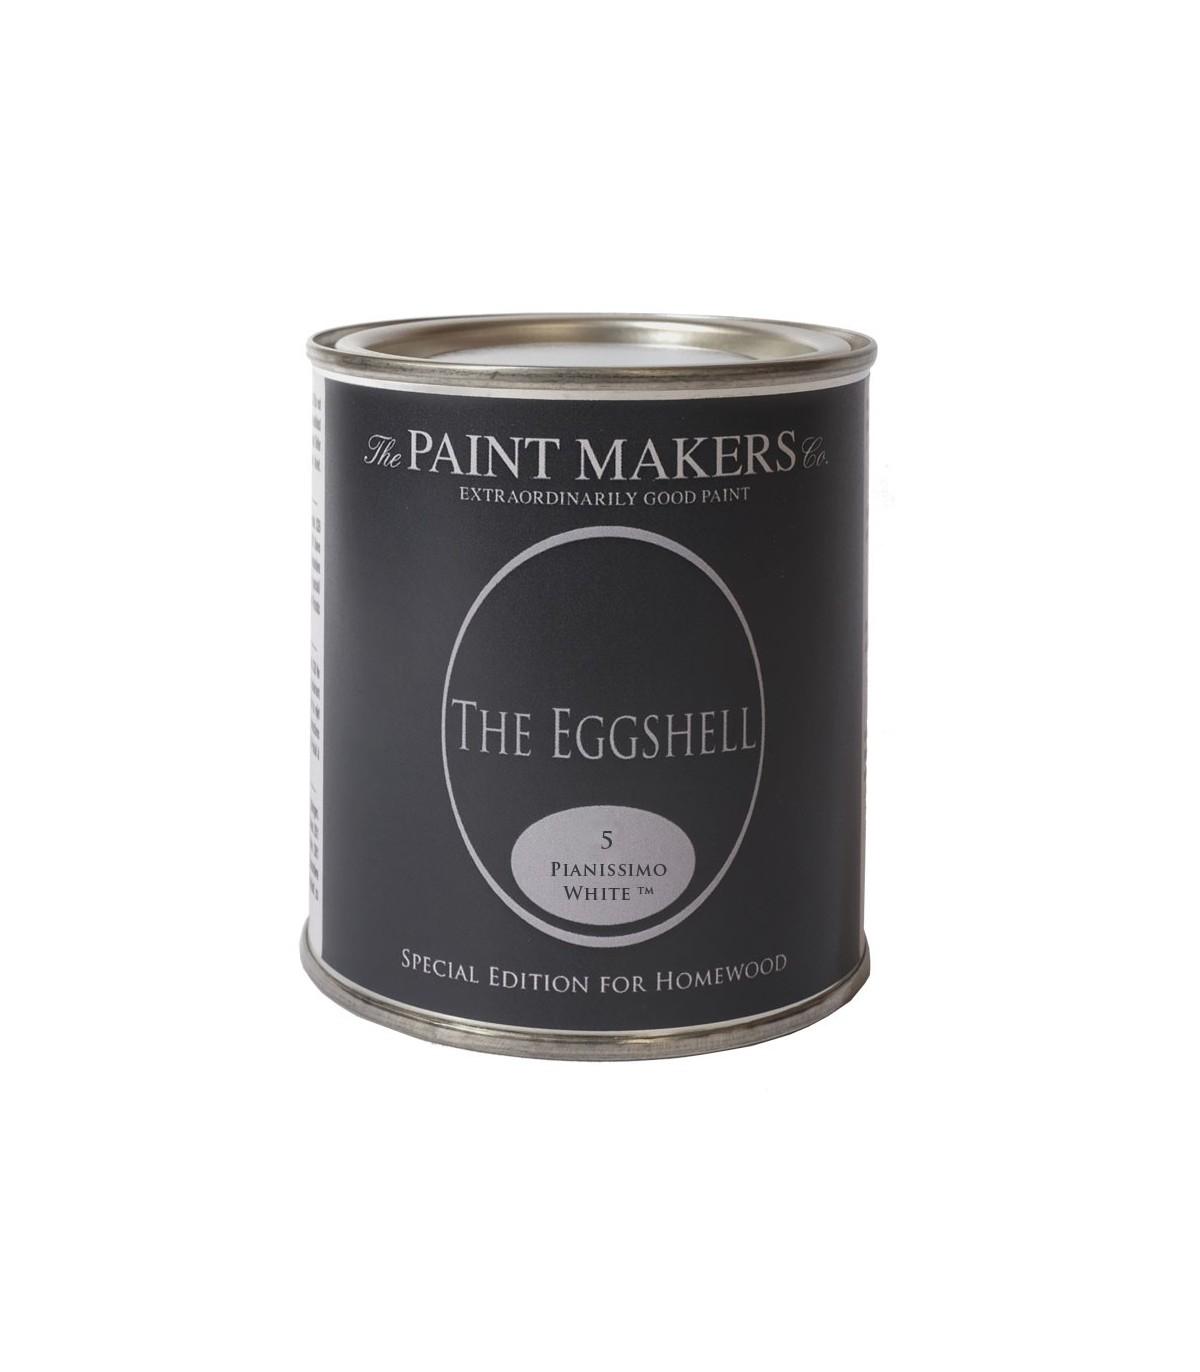 The Eggshell Pittura Per Interni Legno E Metallo The Paint Makers